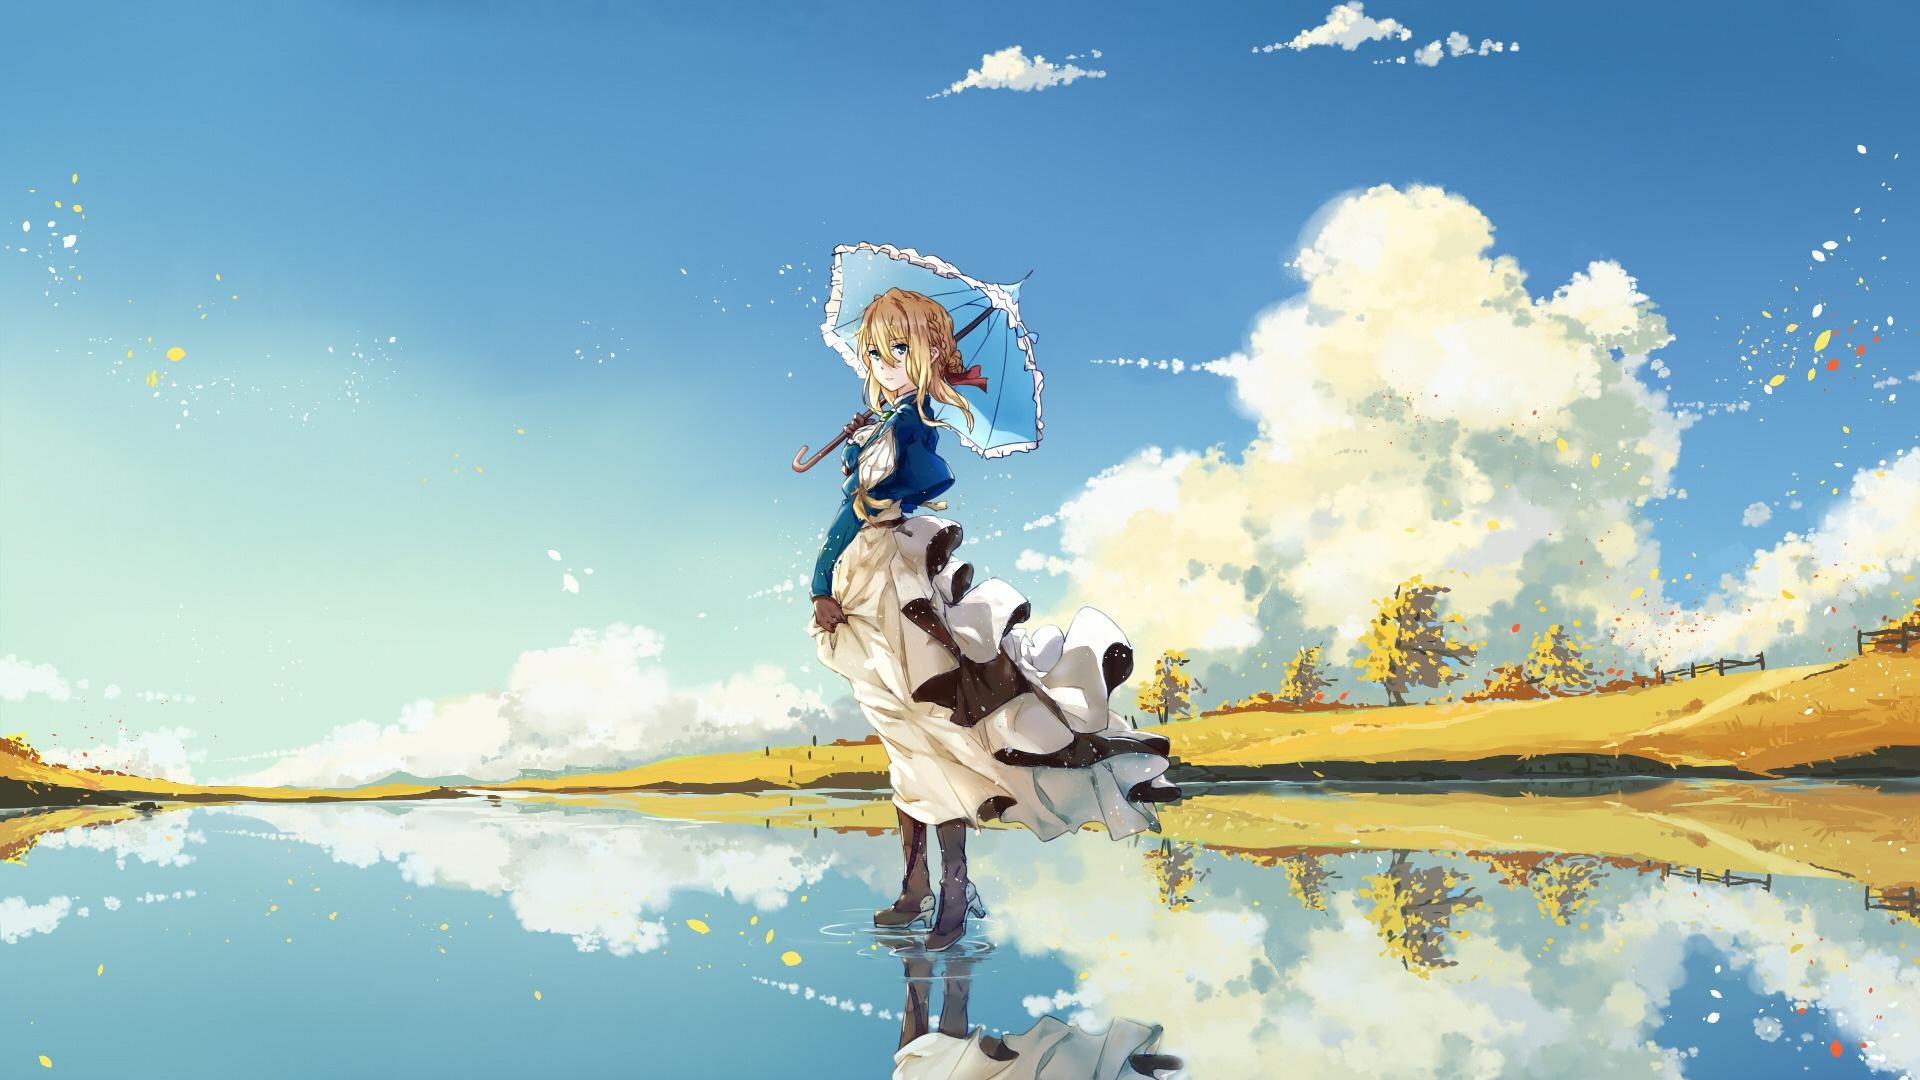 Waifu desktop background